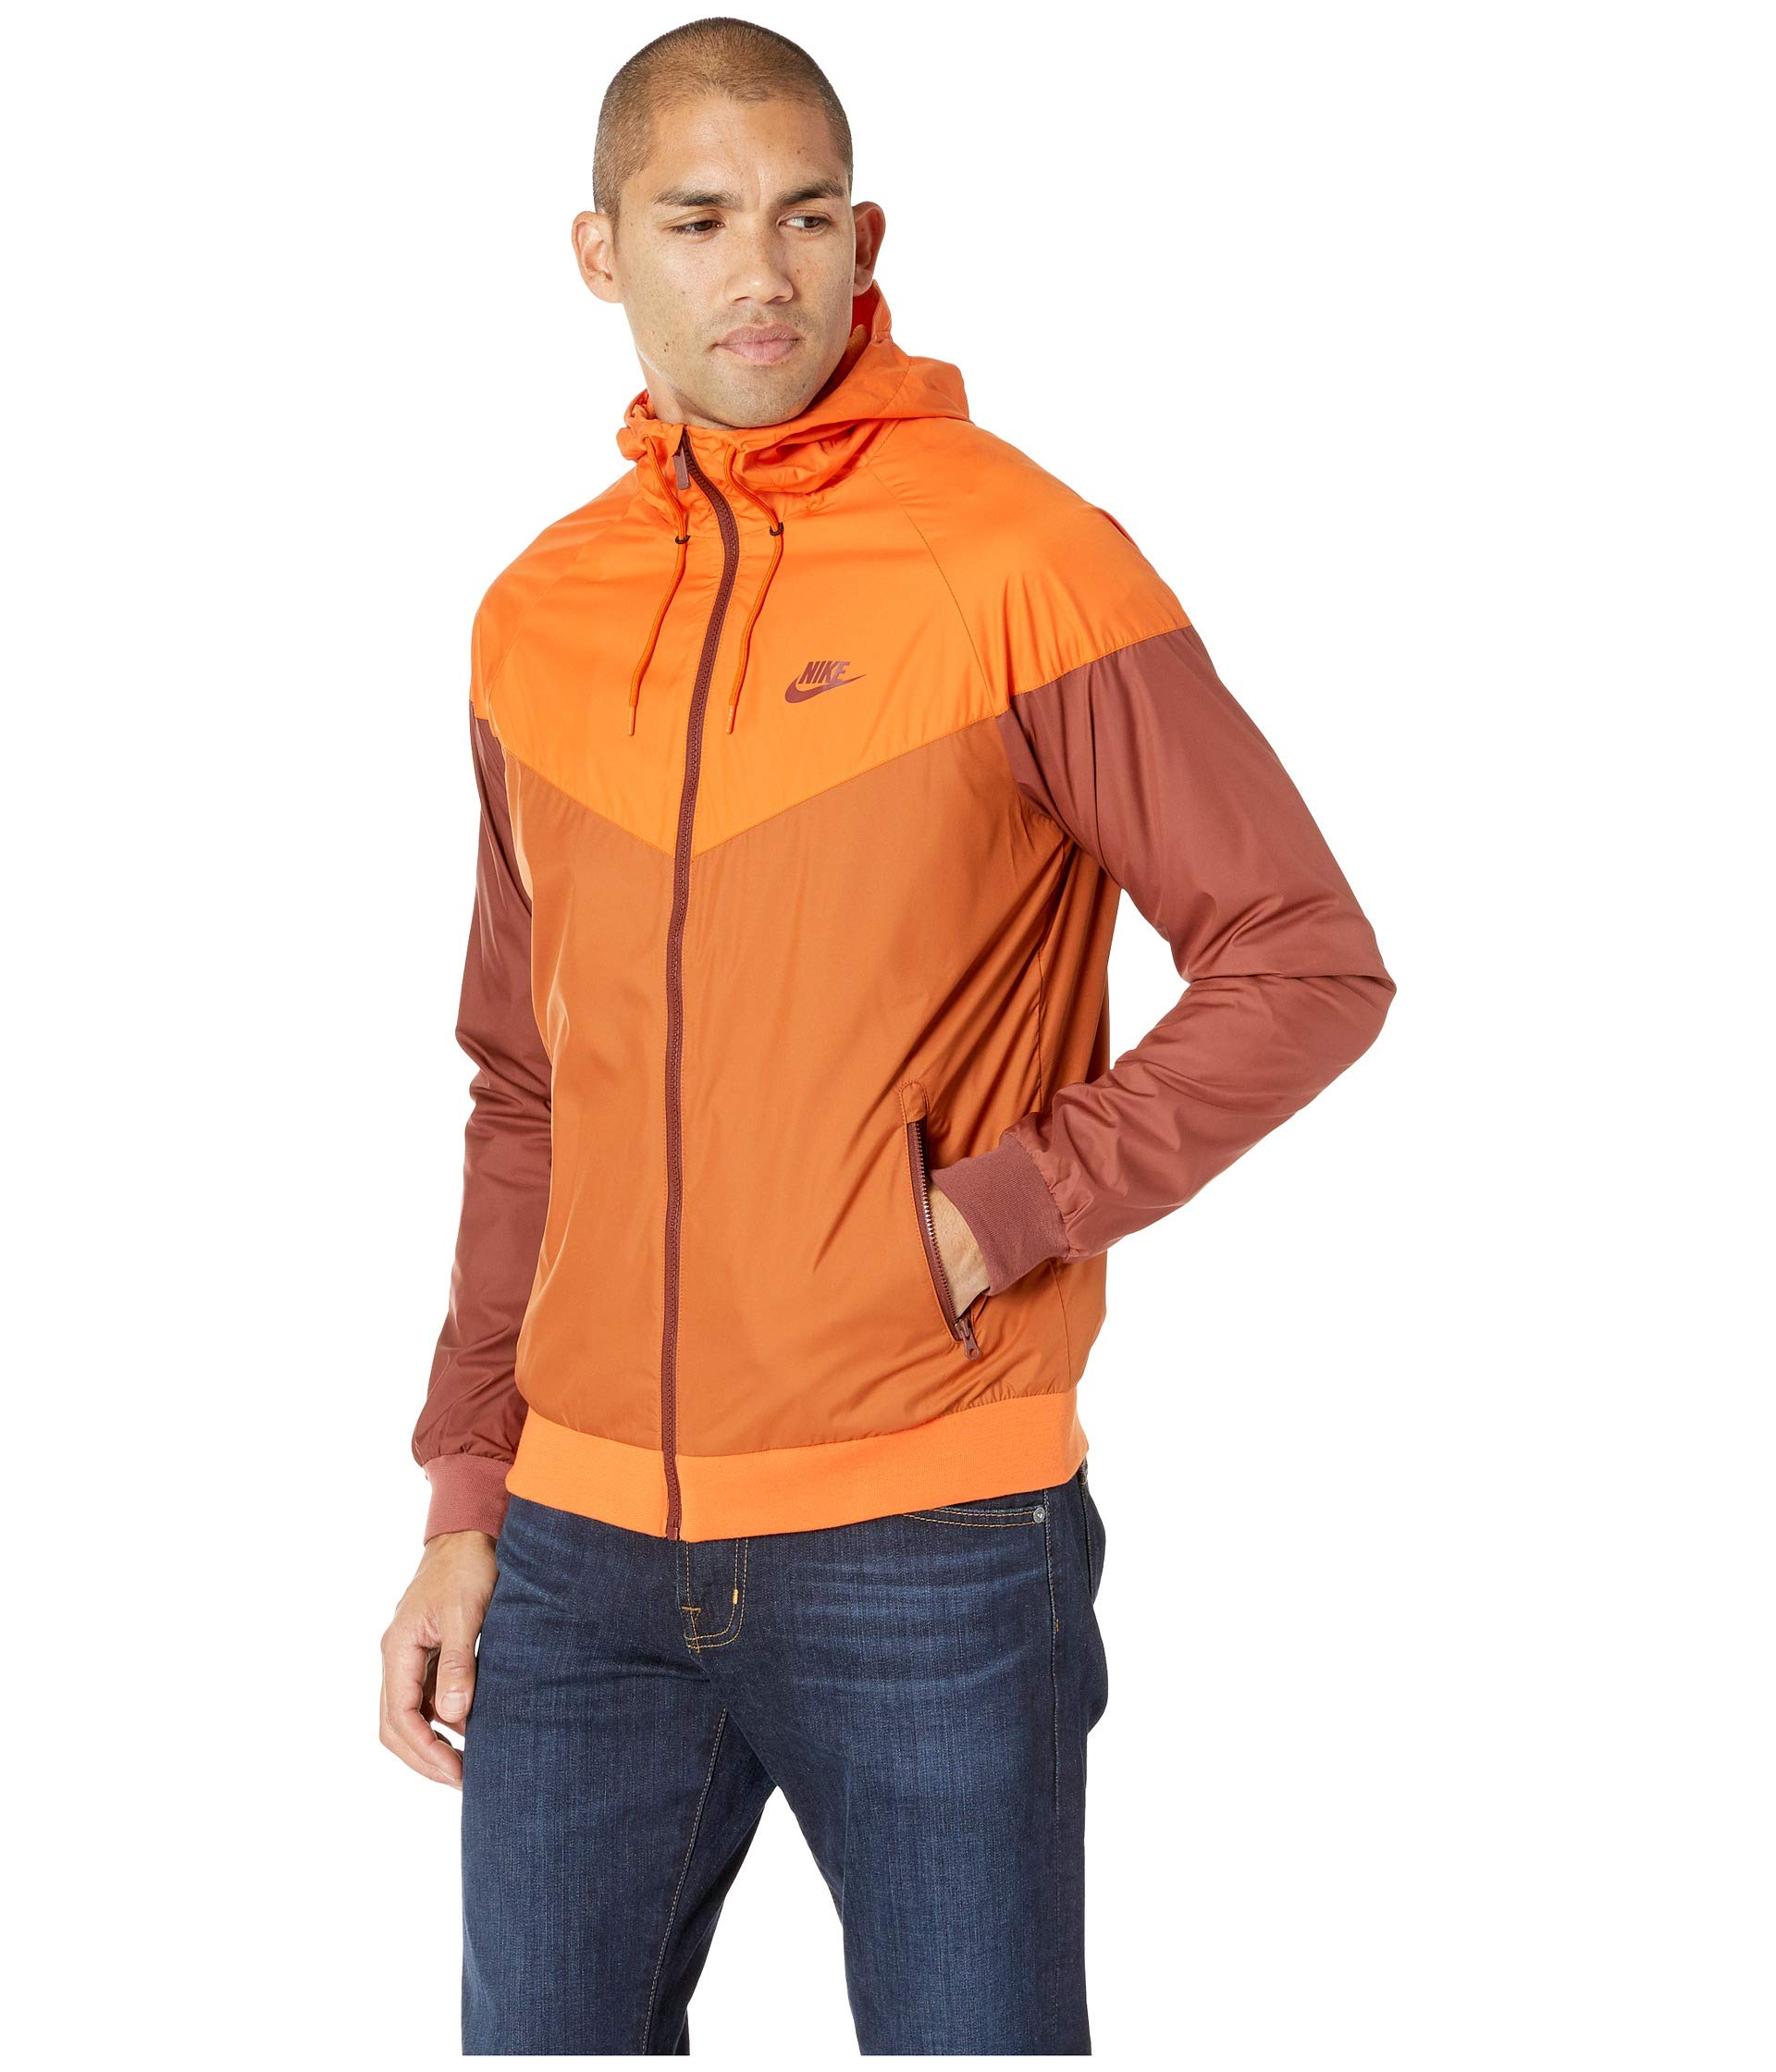 Nike Men's Windrunner Full Zip Jacket (Cmpfre Ornge/Dk Russet/Small) by Nike (Image #3)